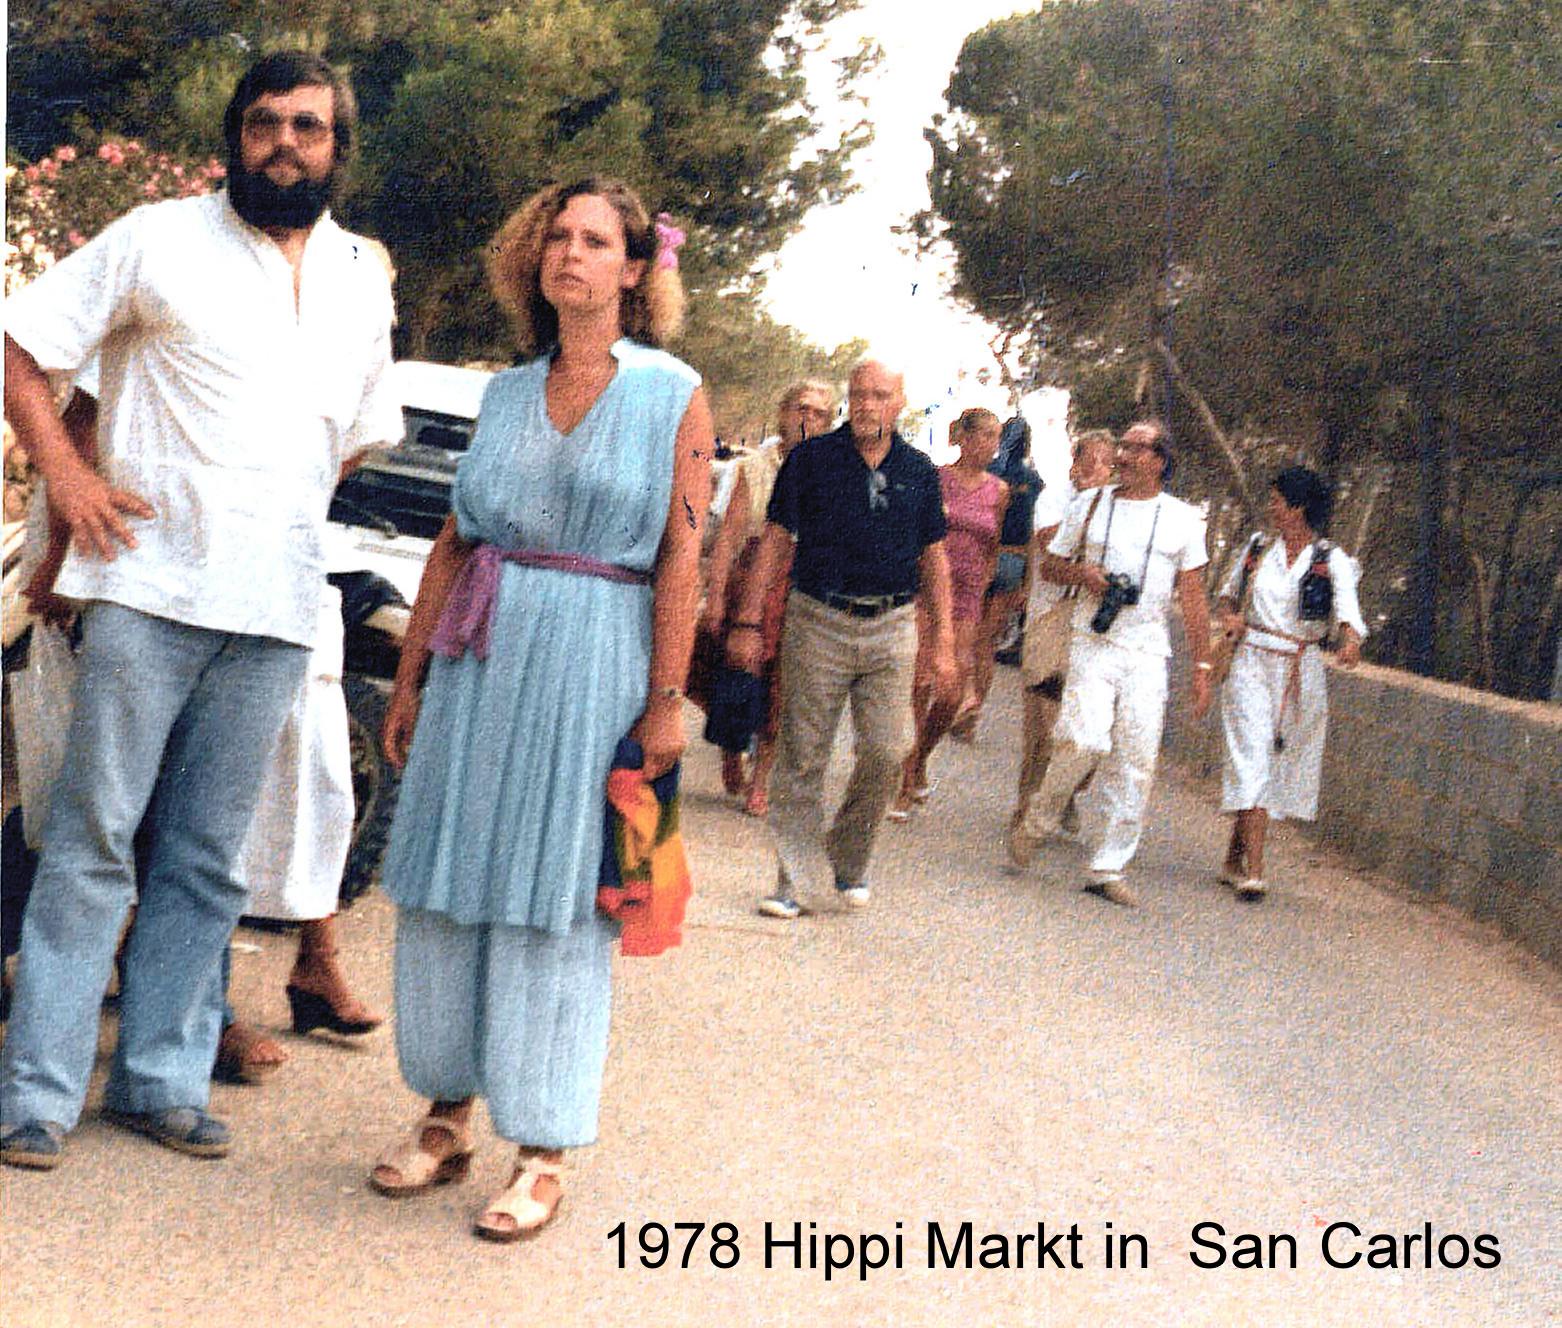 1978 Hippi Markt